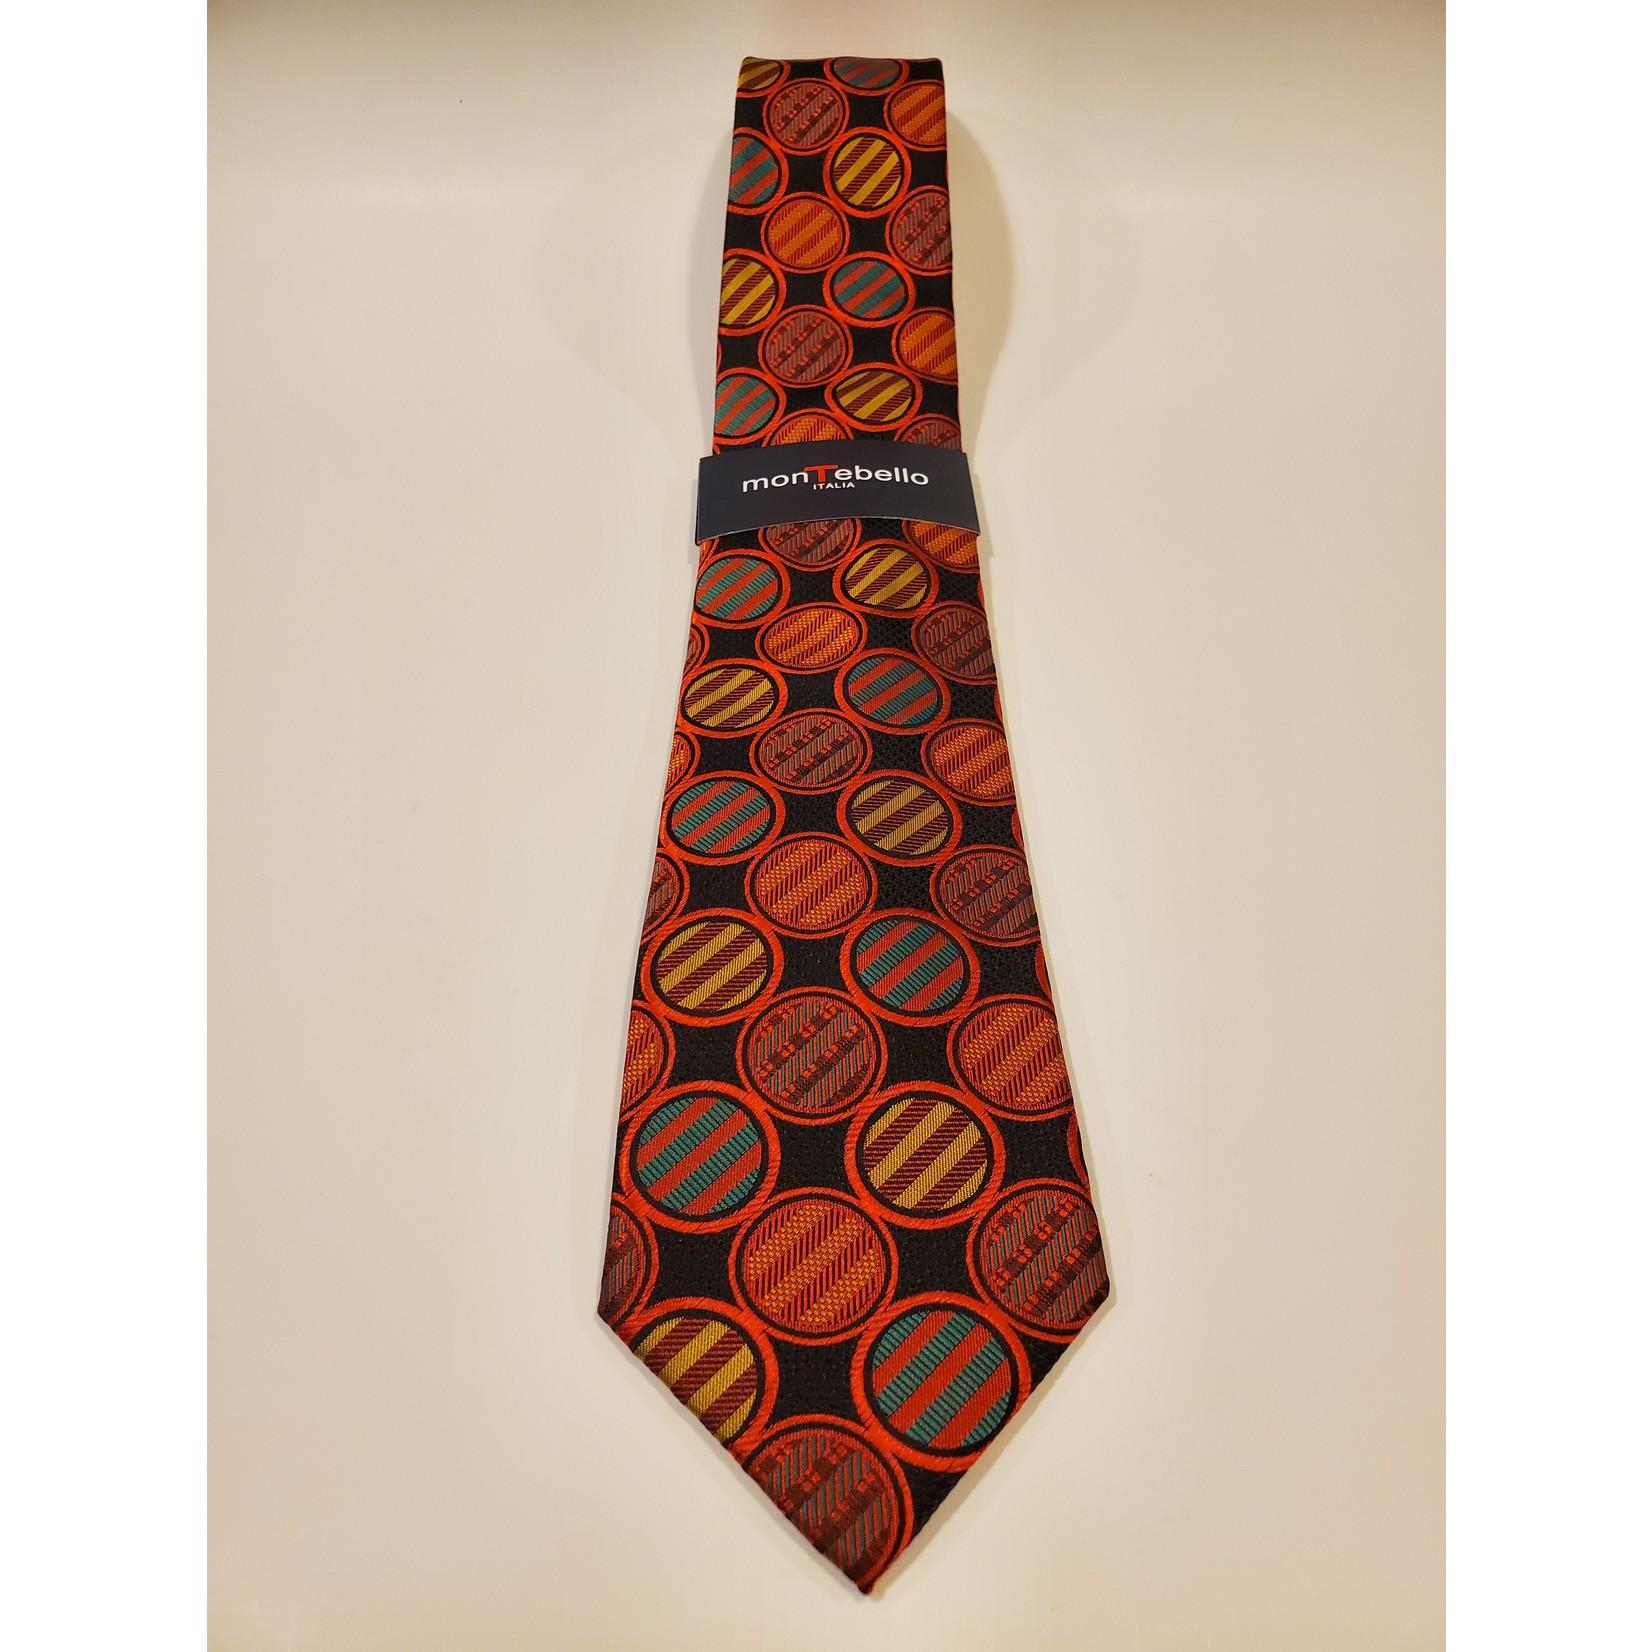 Montebello 1700 Jacquard Silk Tie - Red Circle Pattern